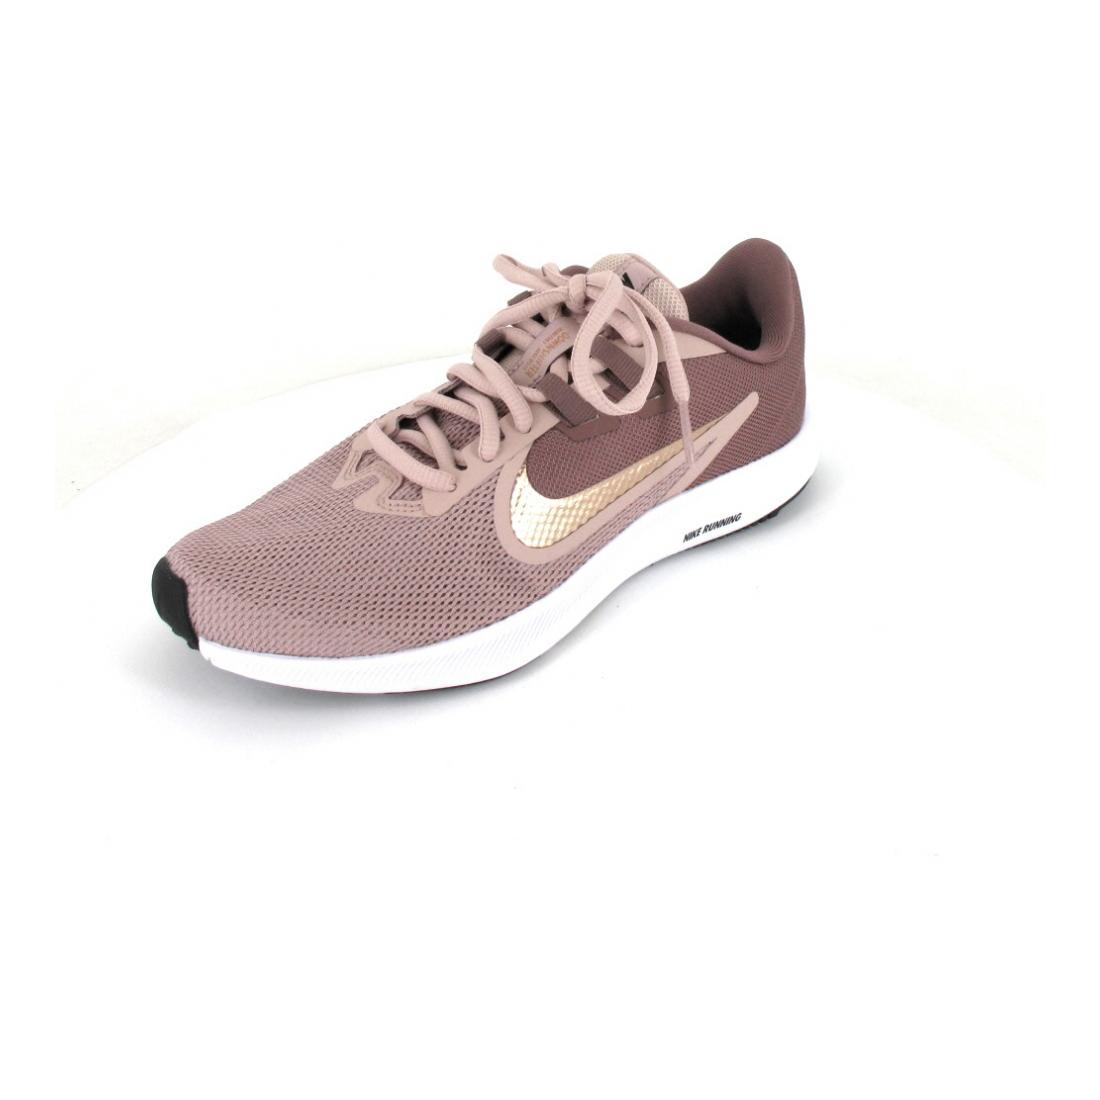 Nike Sportschuh WMNS Downshifter 9